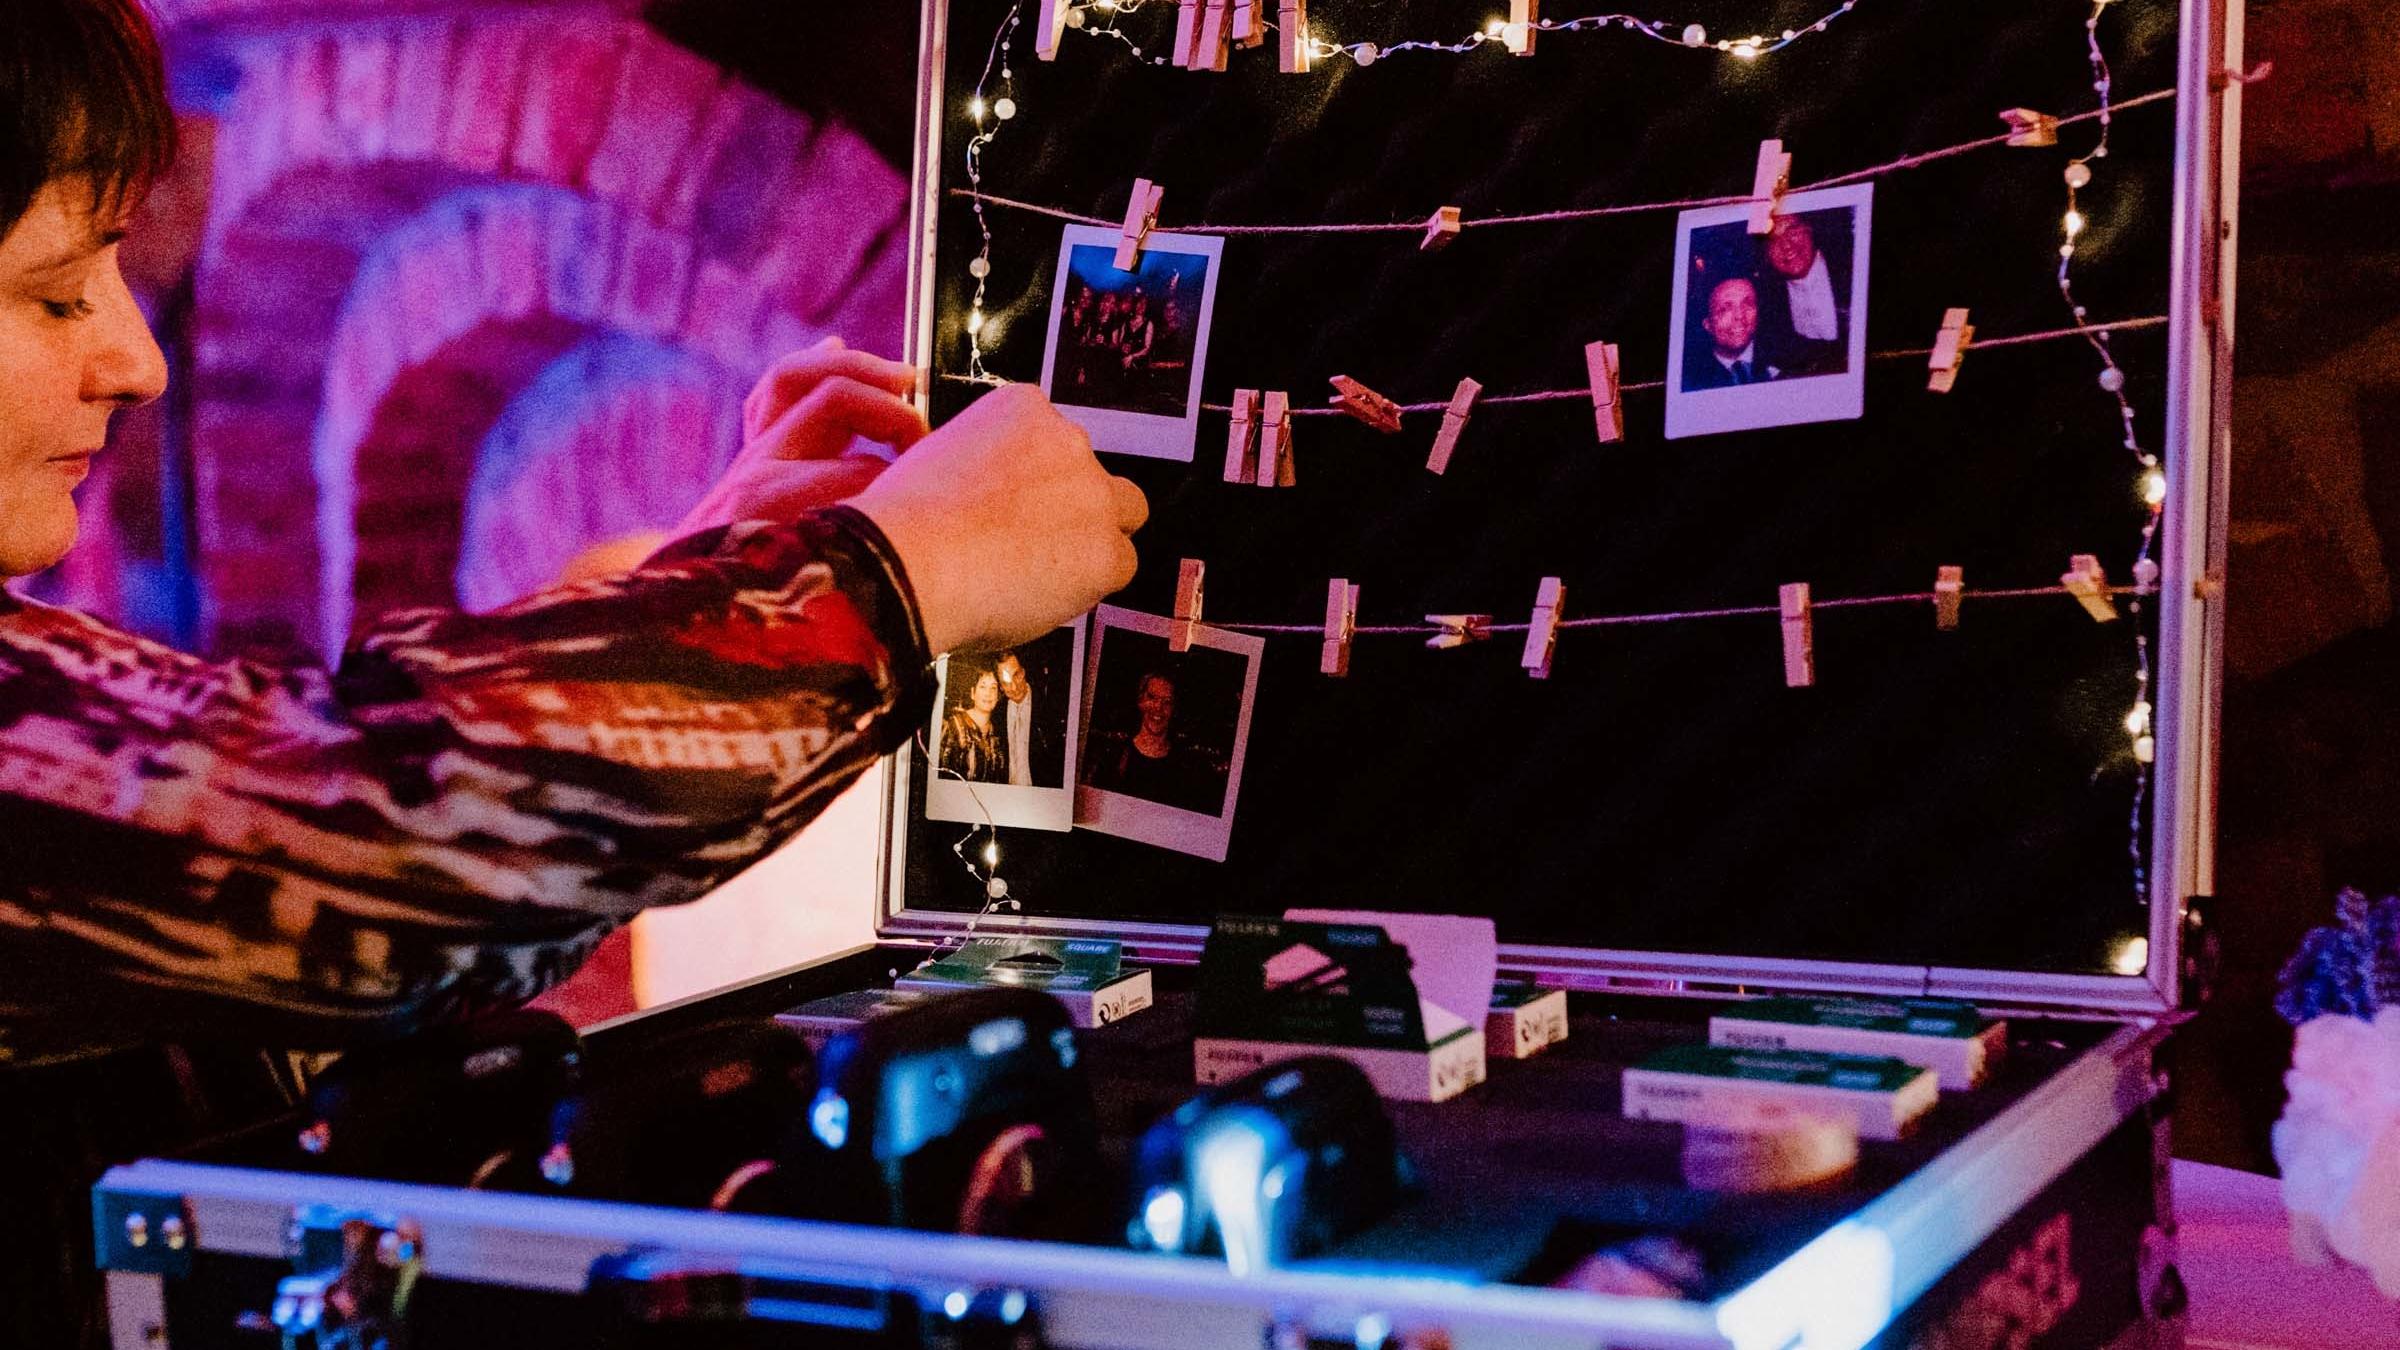 Barformat | Partner | Knipsel | Polaroid | Kamera | Set | Event | Mieten | Instax | Leihen | Event | Hochzeit | Sofortbild